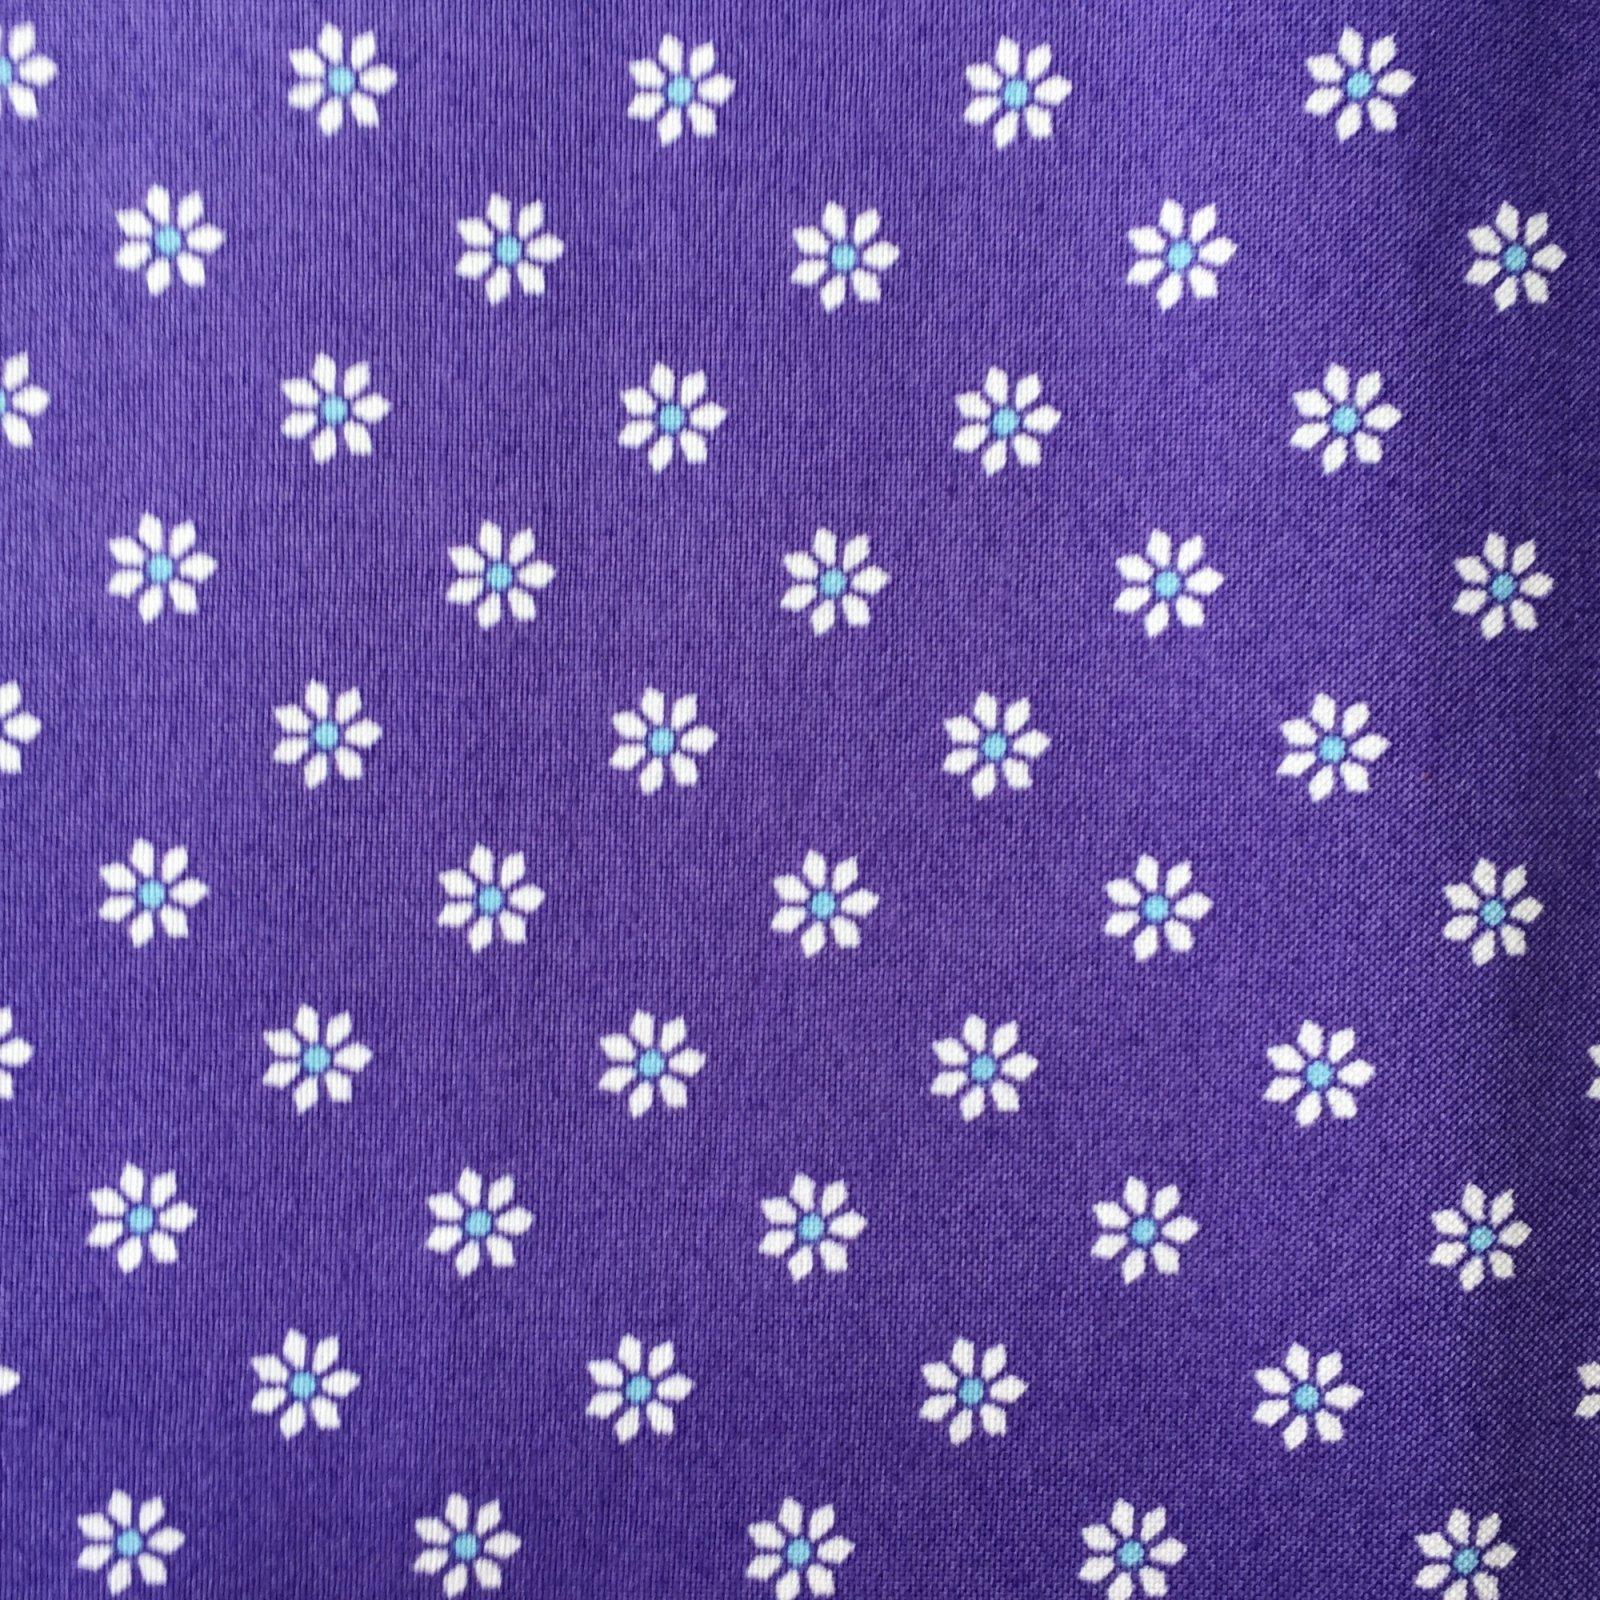 Bombay Flowers - Bright Purple